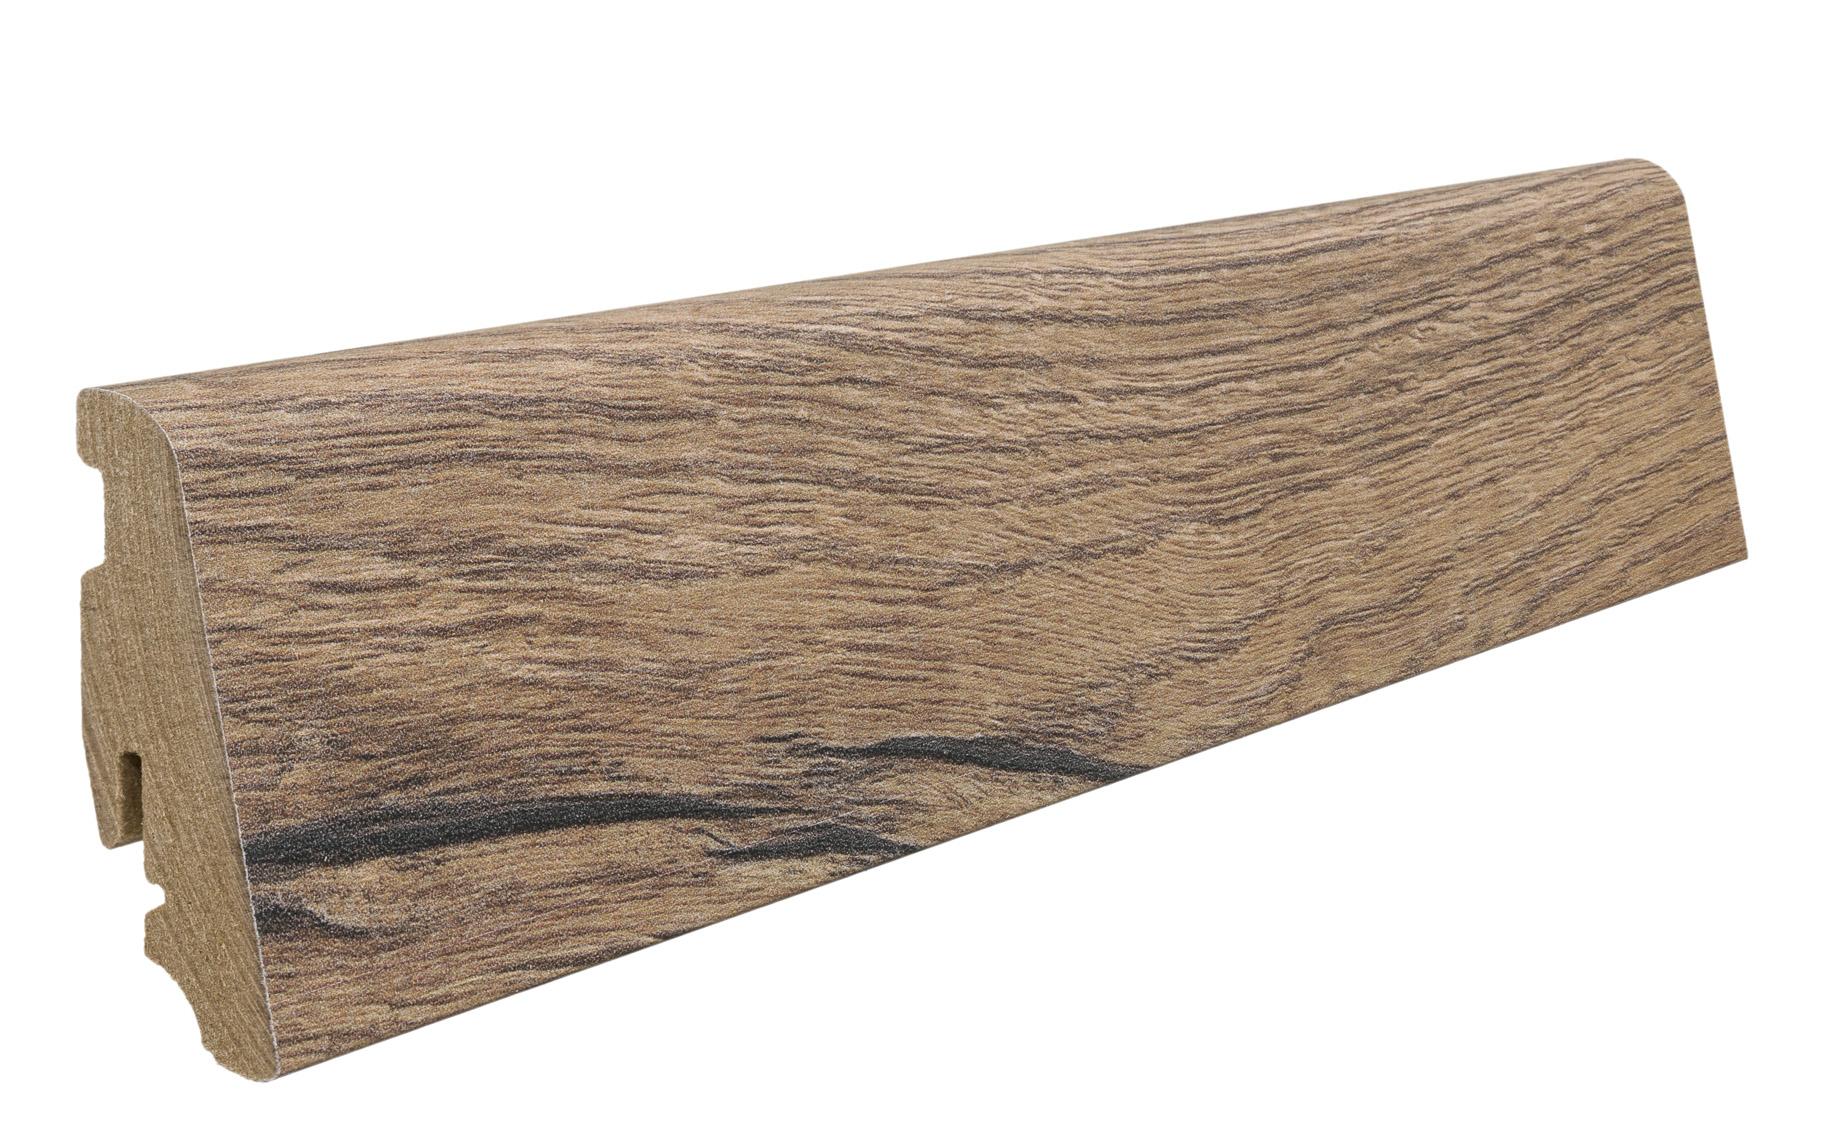 408609 haro laminat fussleiste eiche italica natur foliert. Black Bedroom Furniture Sets. Home Design Ideas